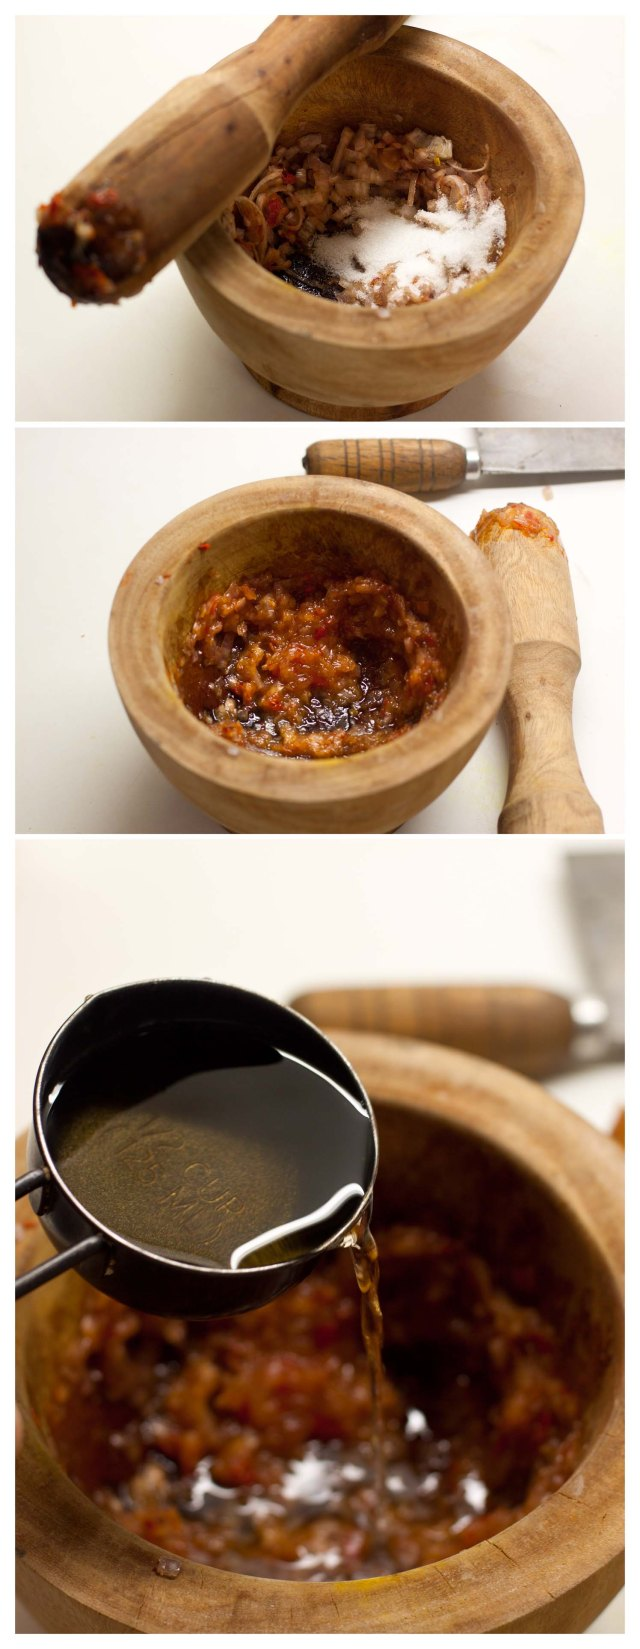 Elaboracion de la salsa